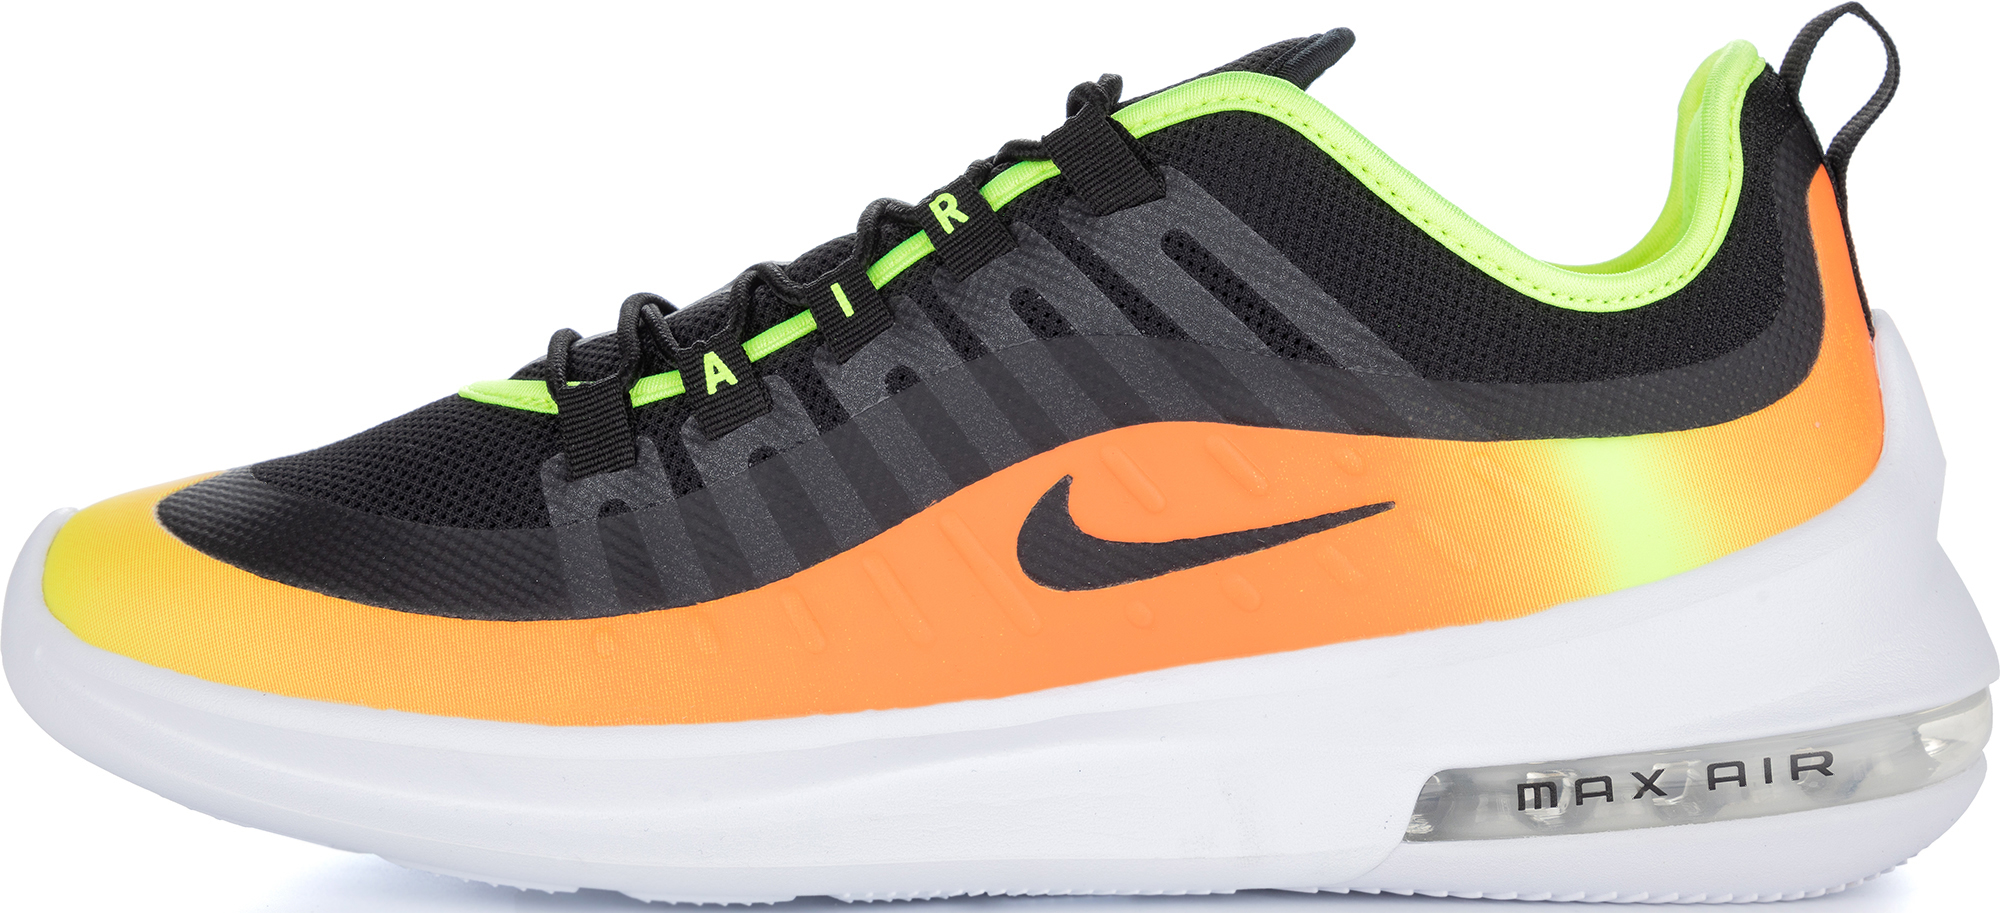 Nike Кроссовки мужские Nike Air Max Axis Premium, размер 44 nike боксерки мужские nike machomai размер 44